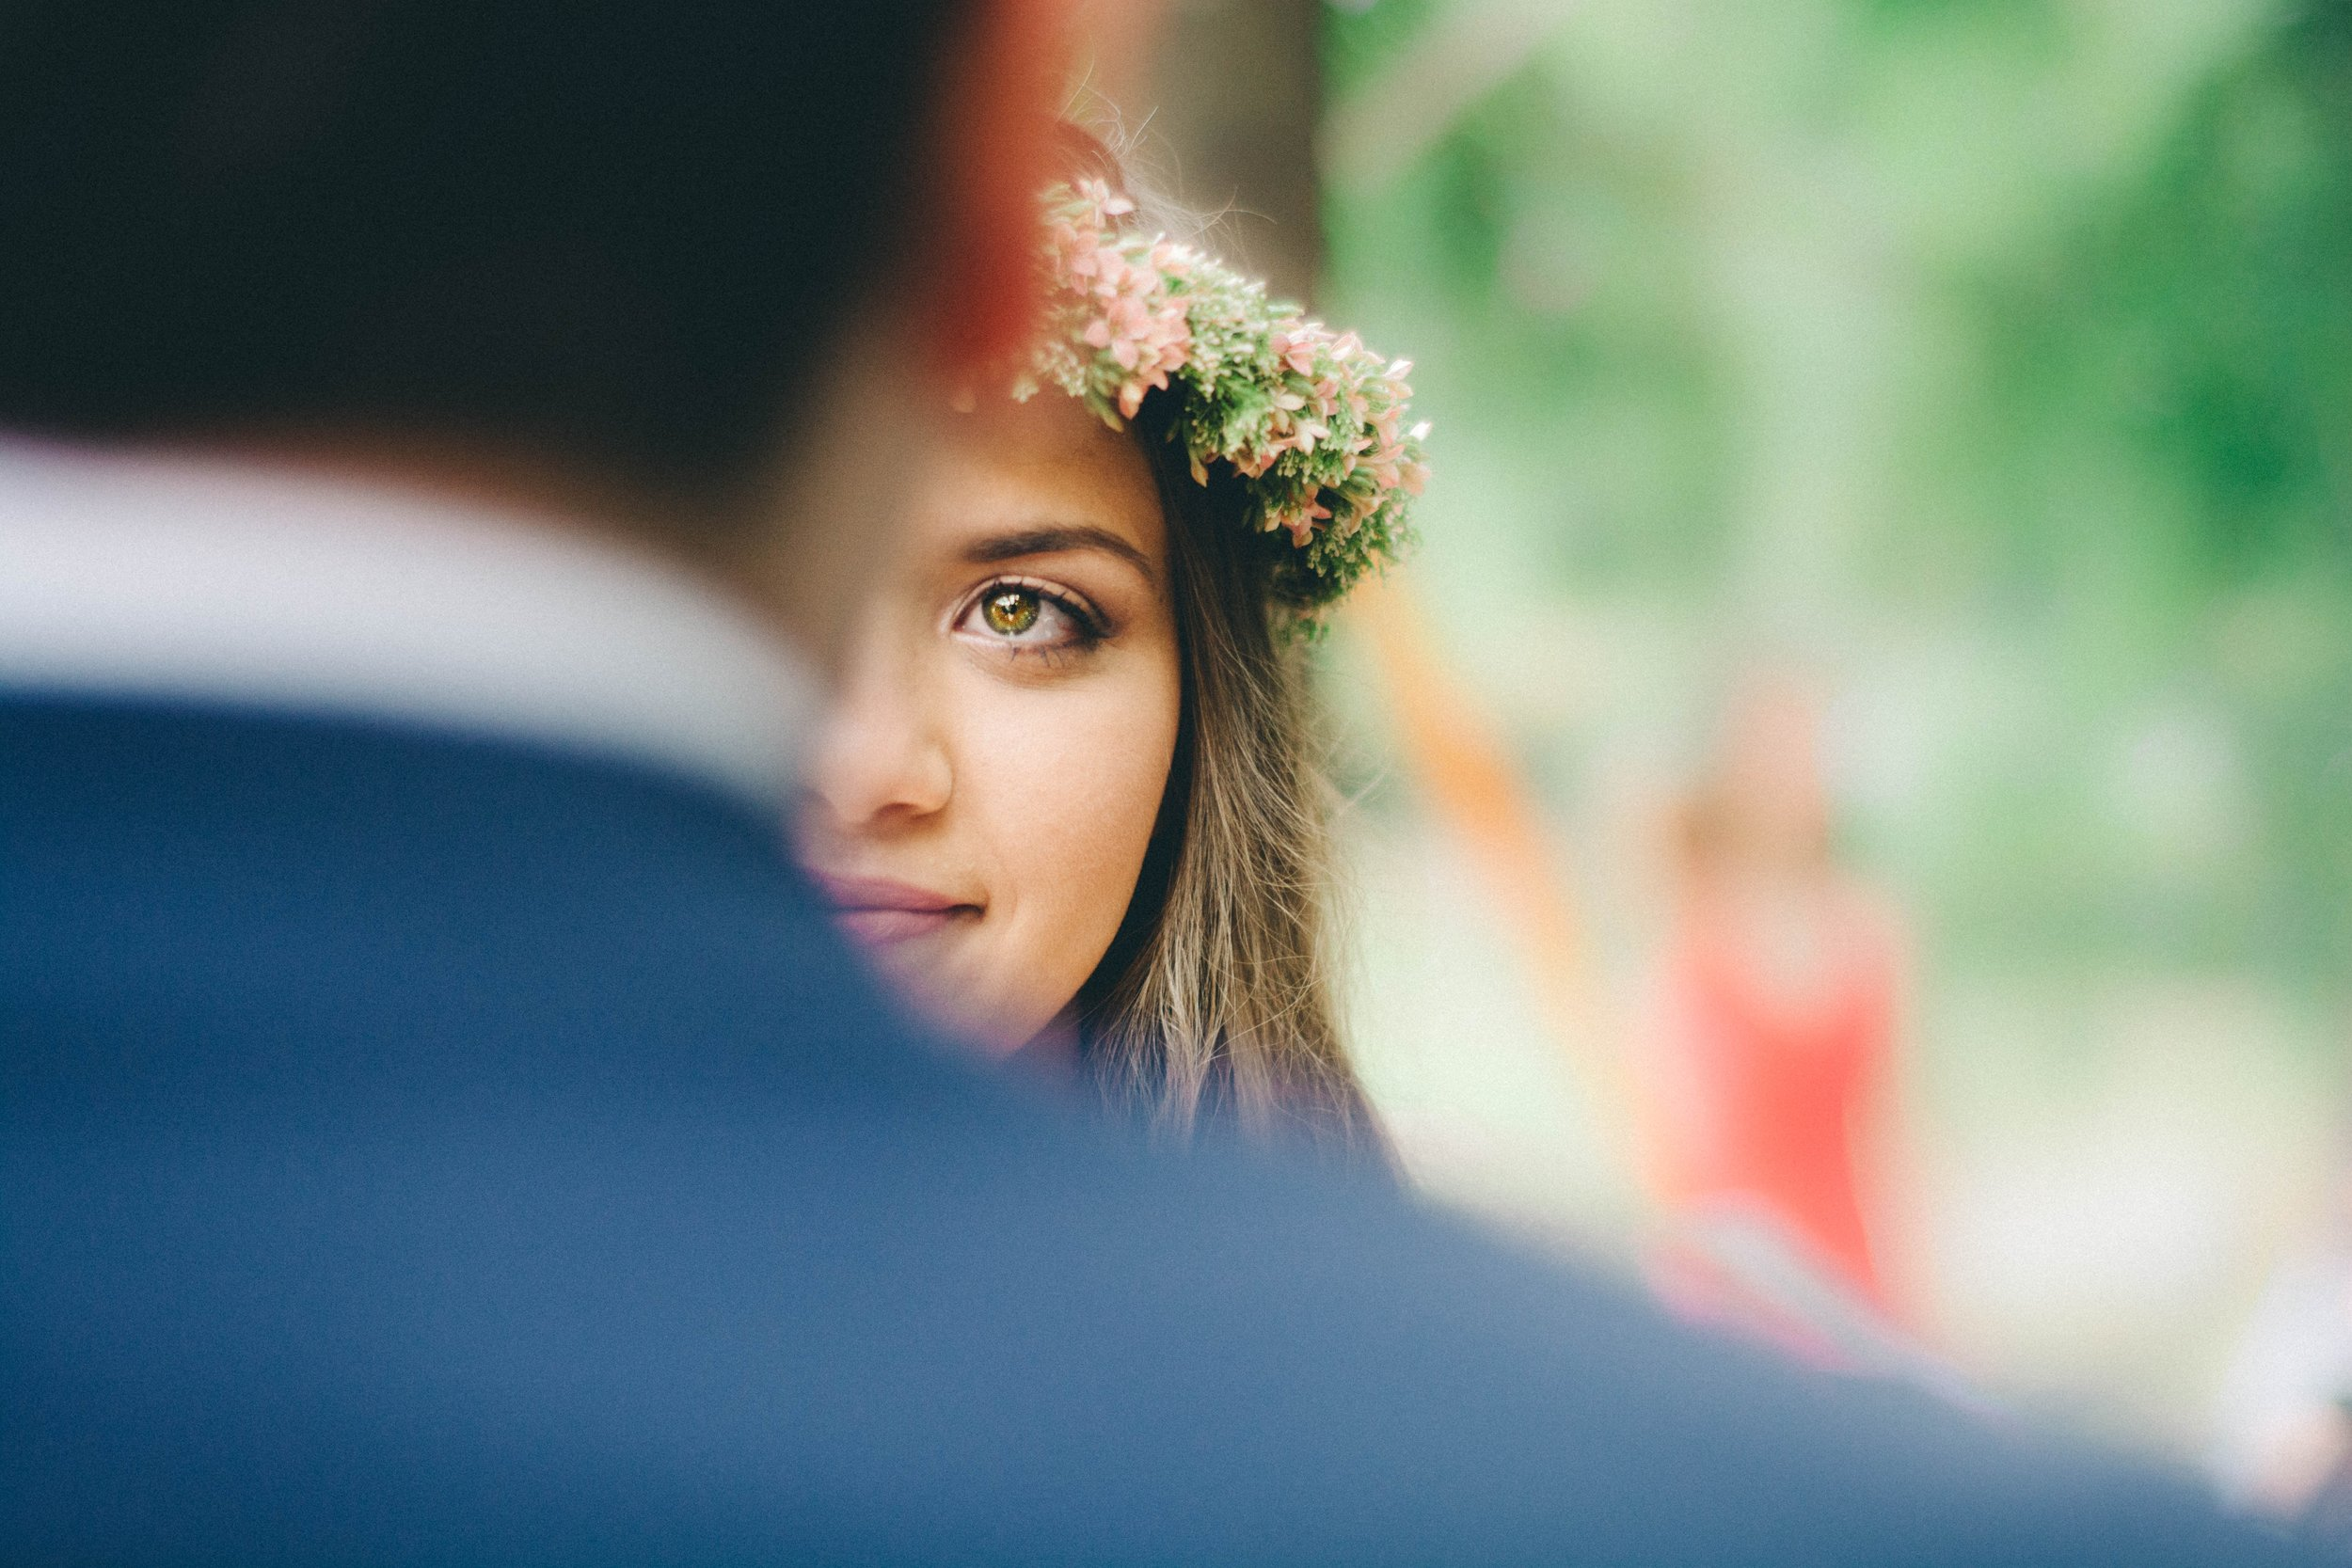 Bride with flower crown looking at her groom